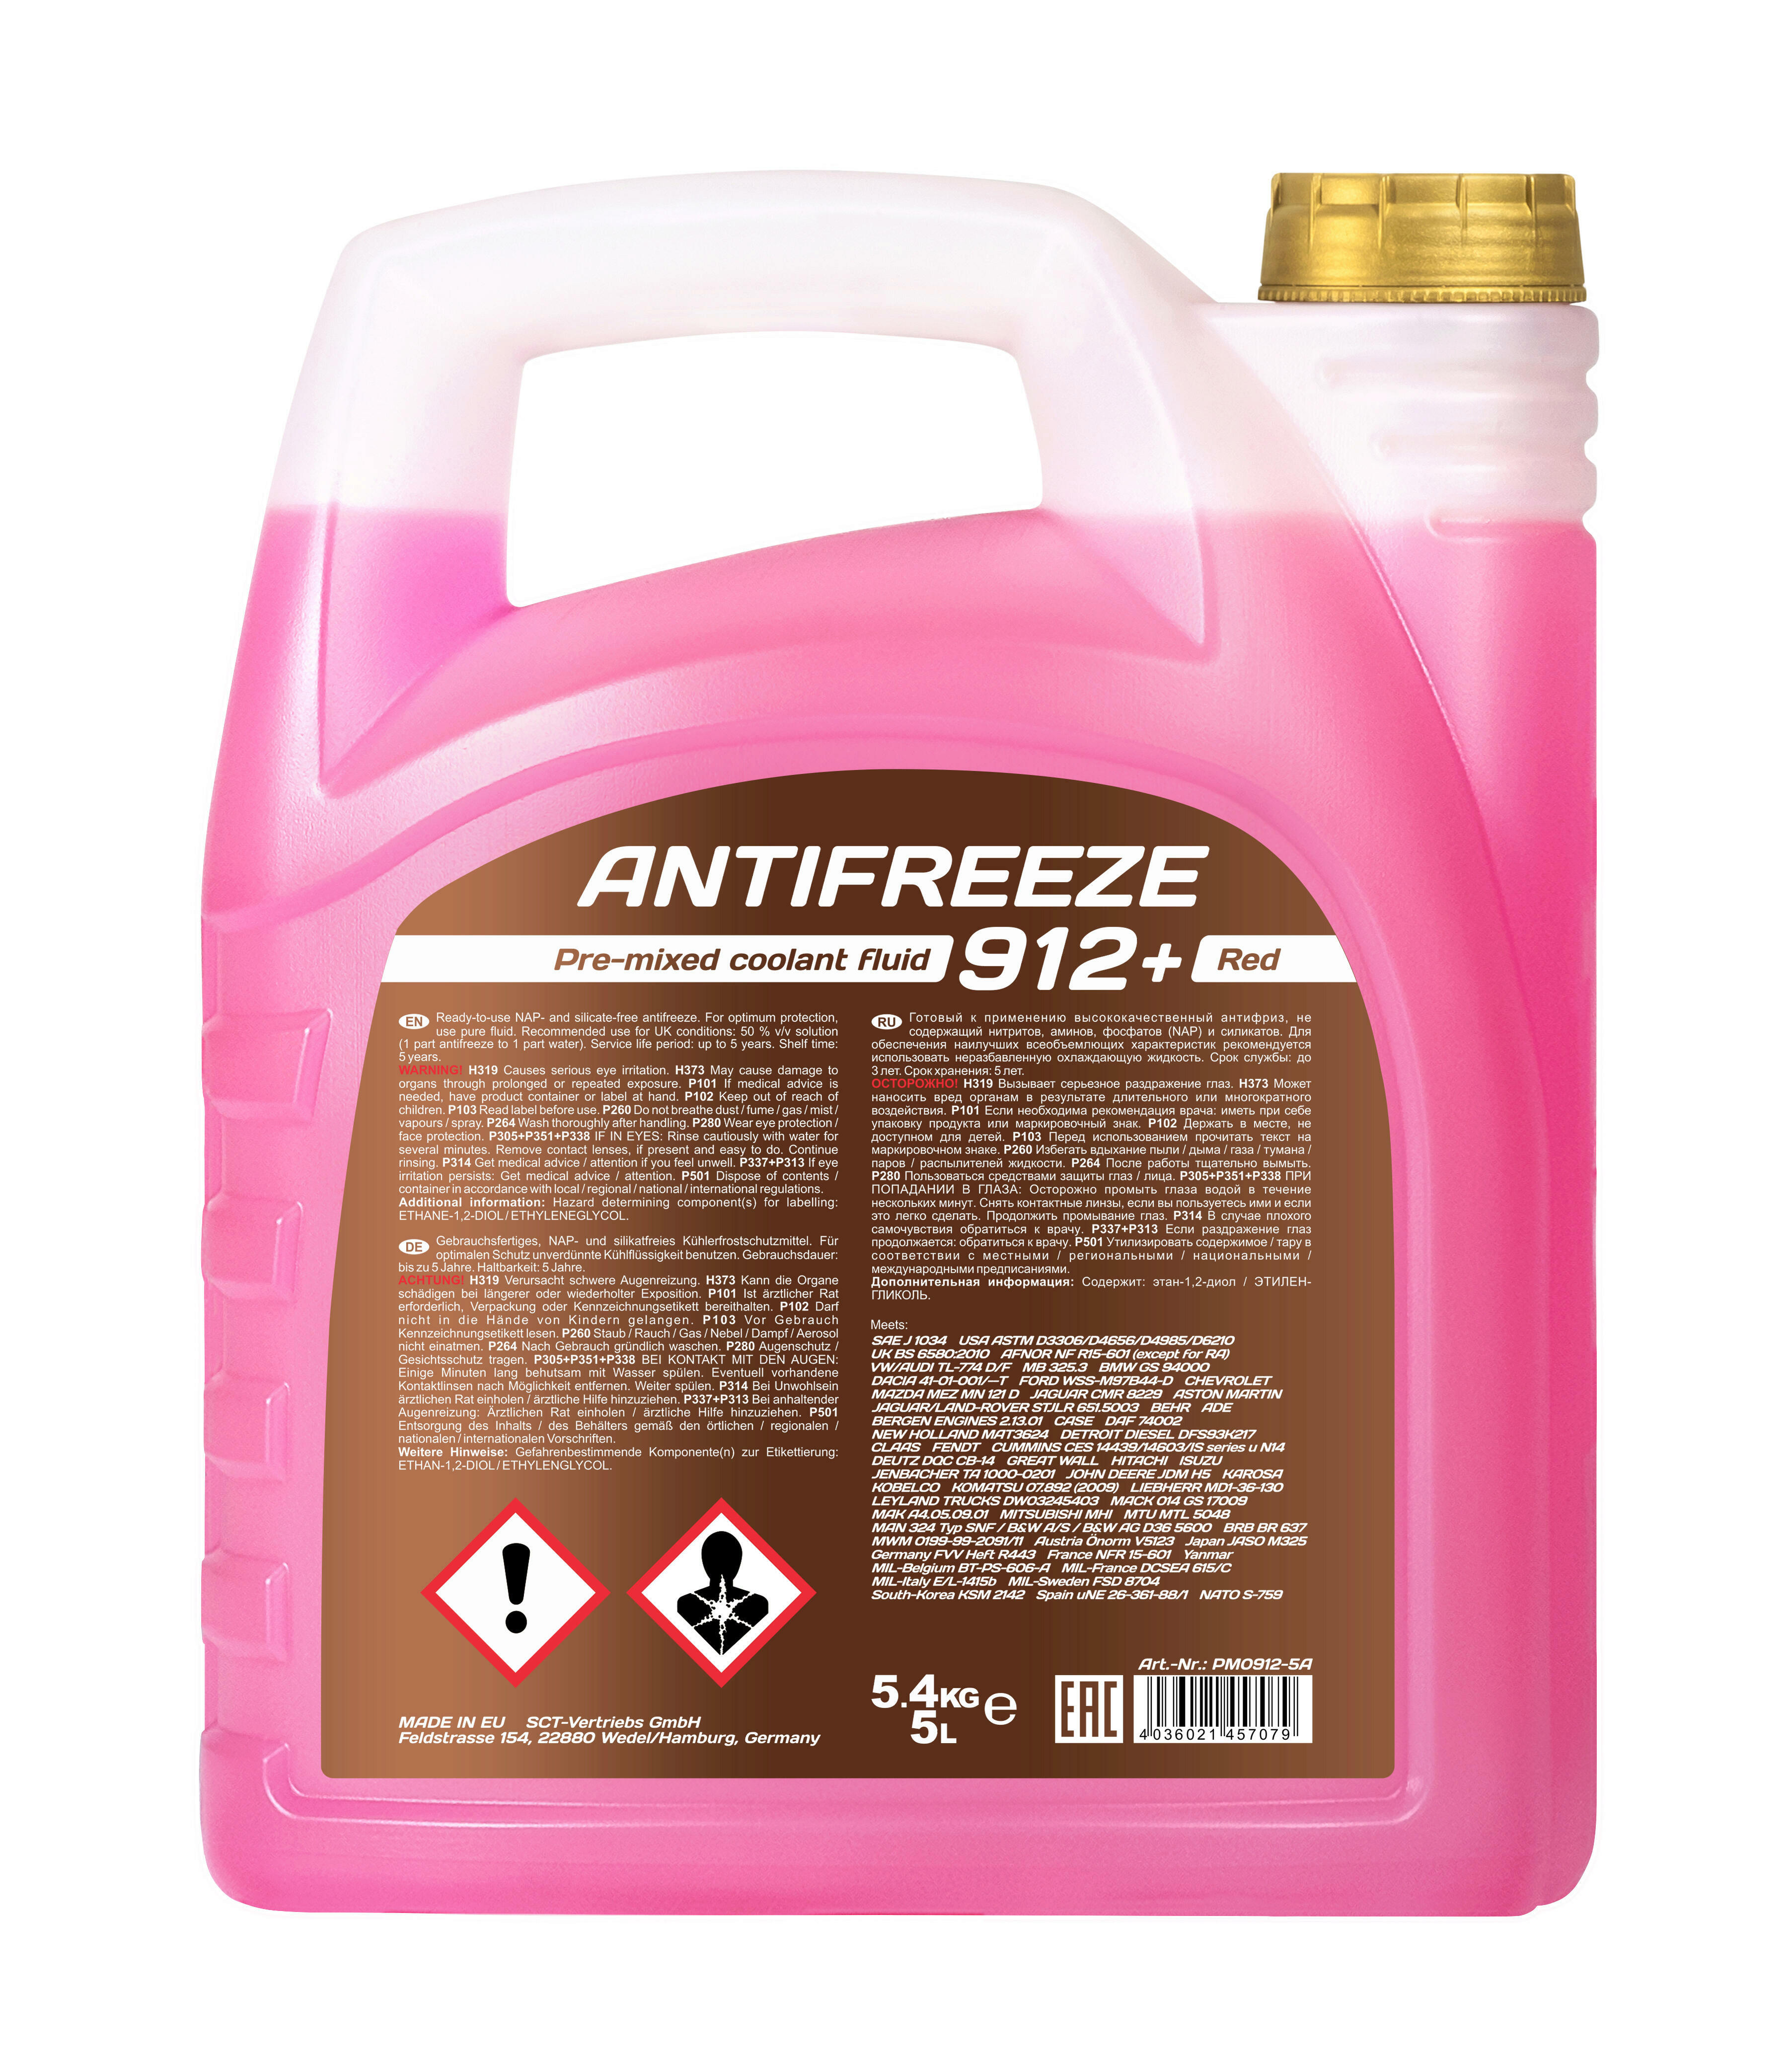 5L Pemco 912+ Antifreeze G12 Kühlerfrostschutz Rot